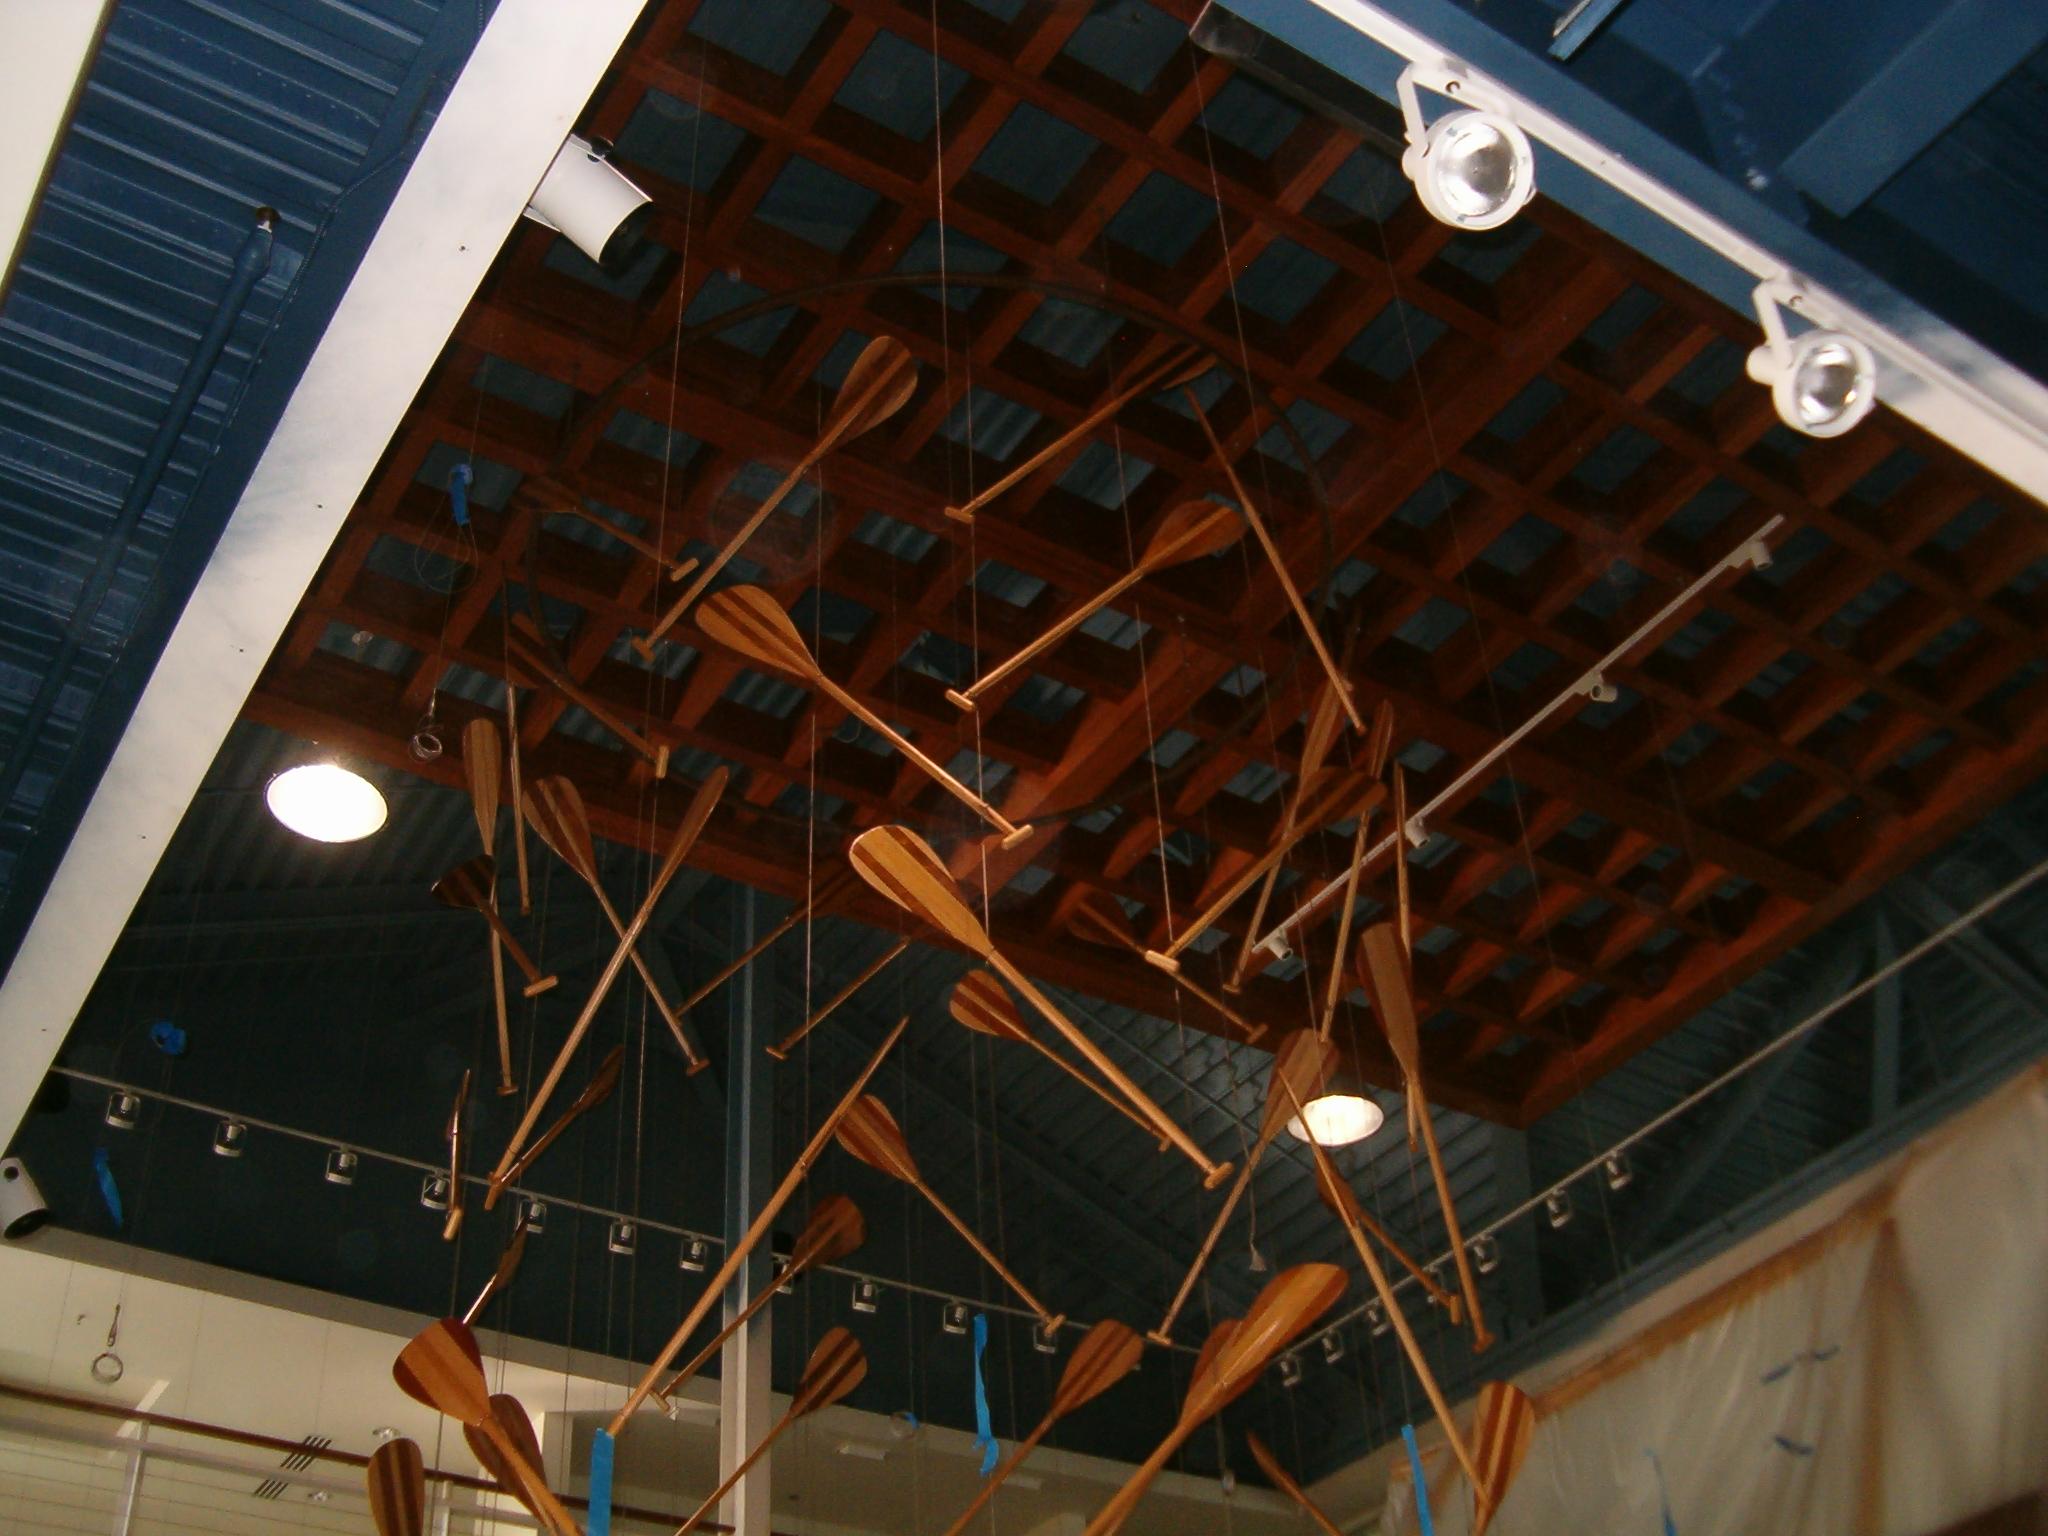 03 Canoe Paddles Hanging from Ceiling.JPG